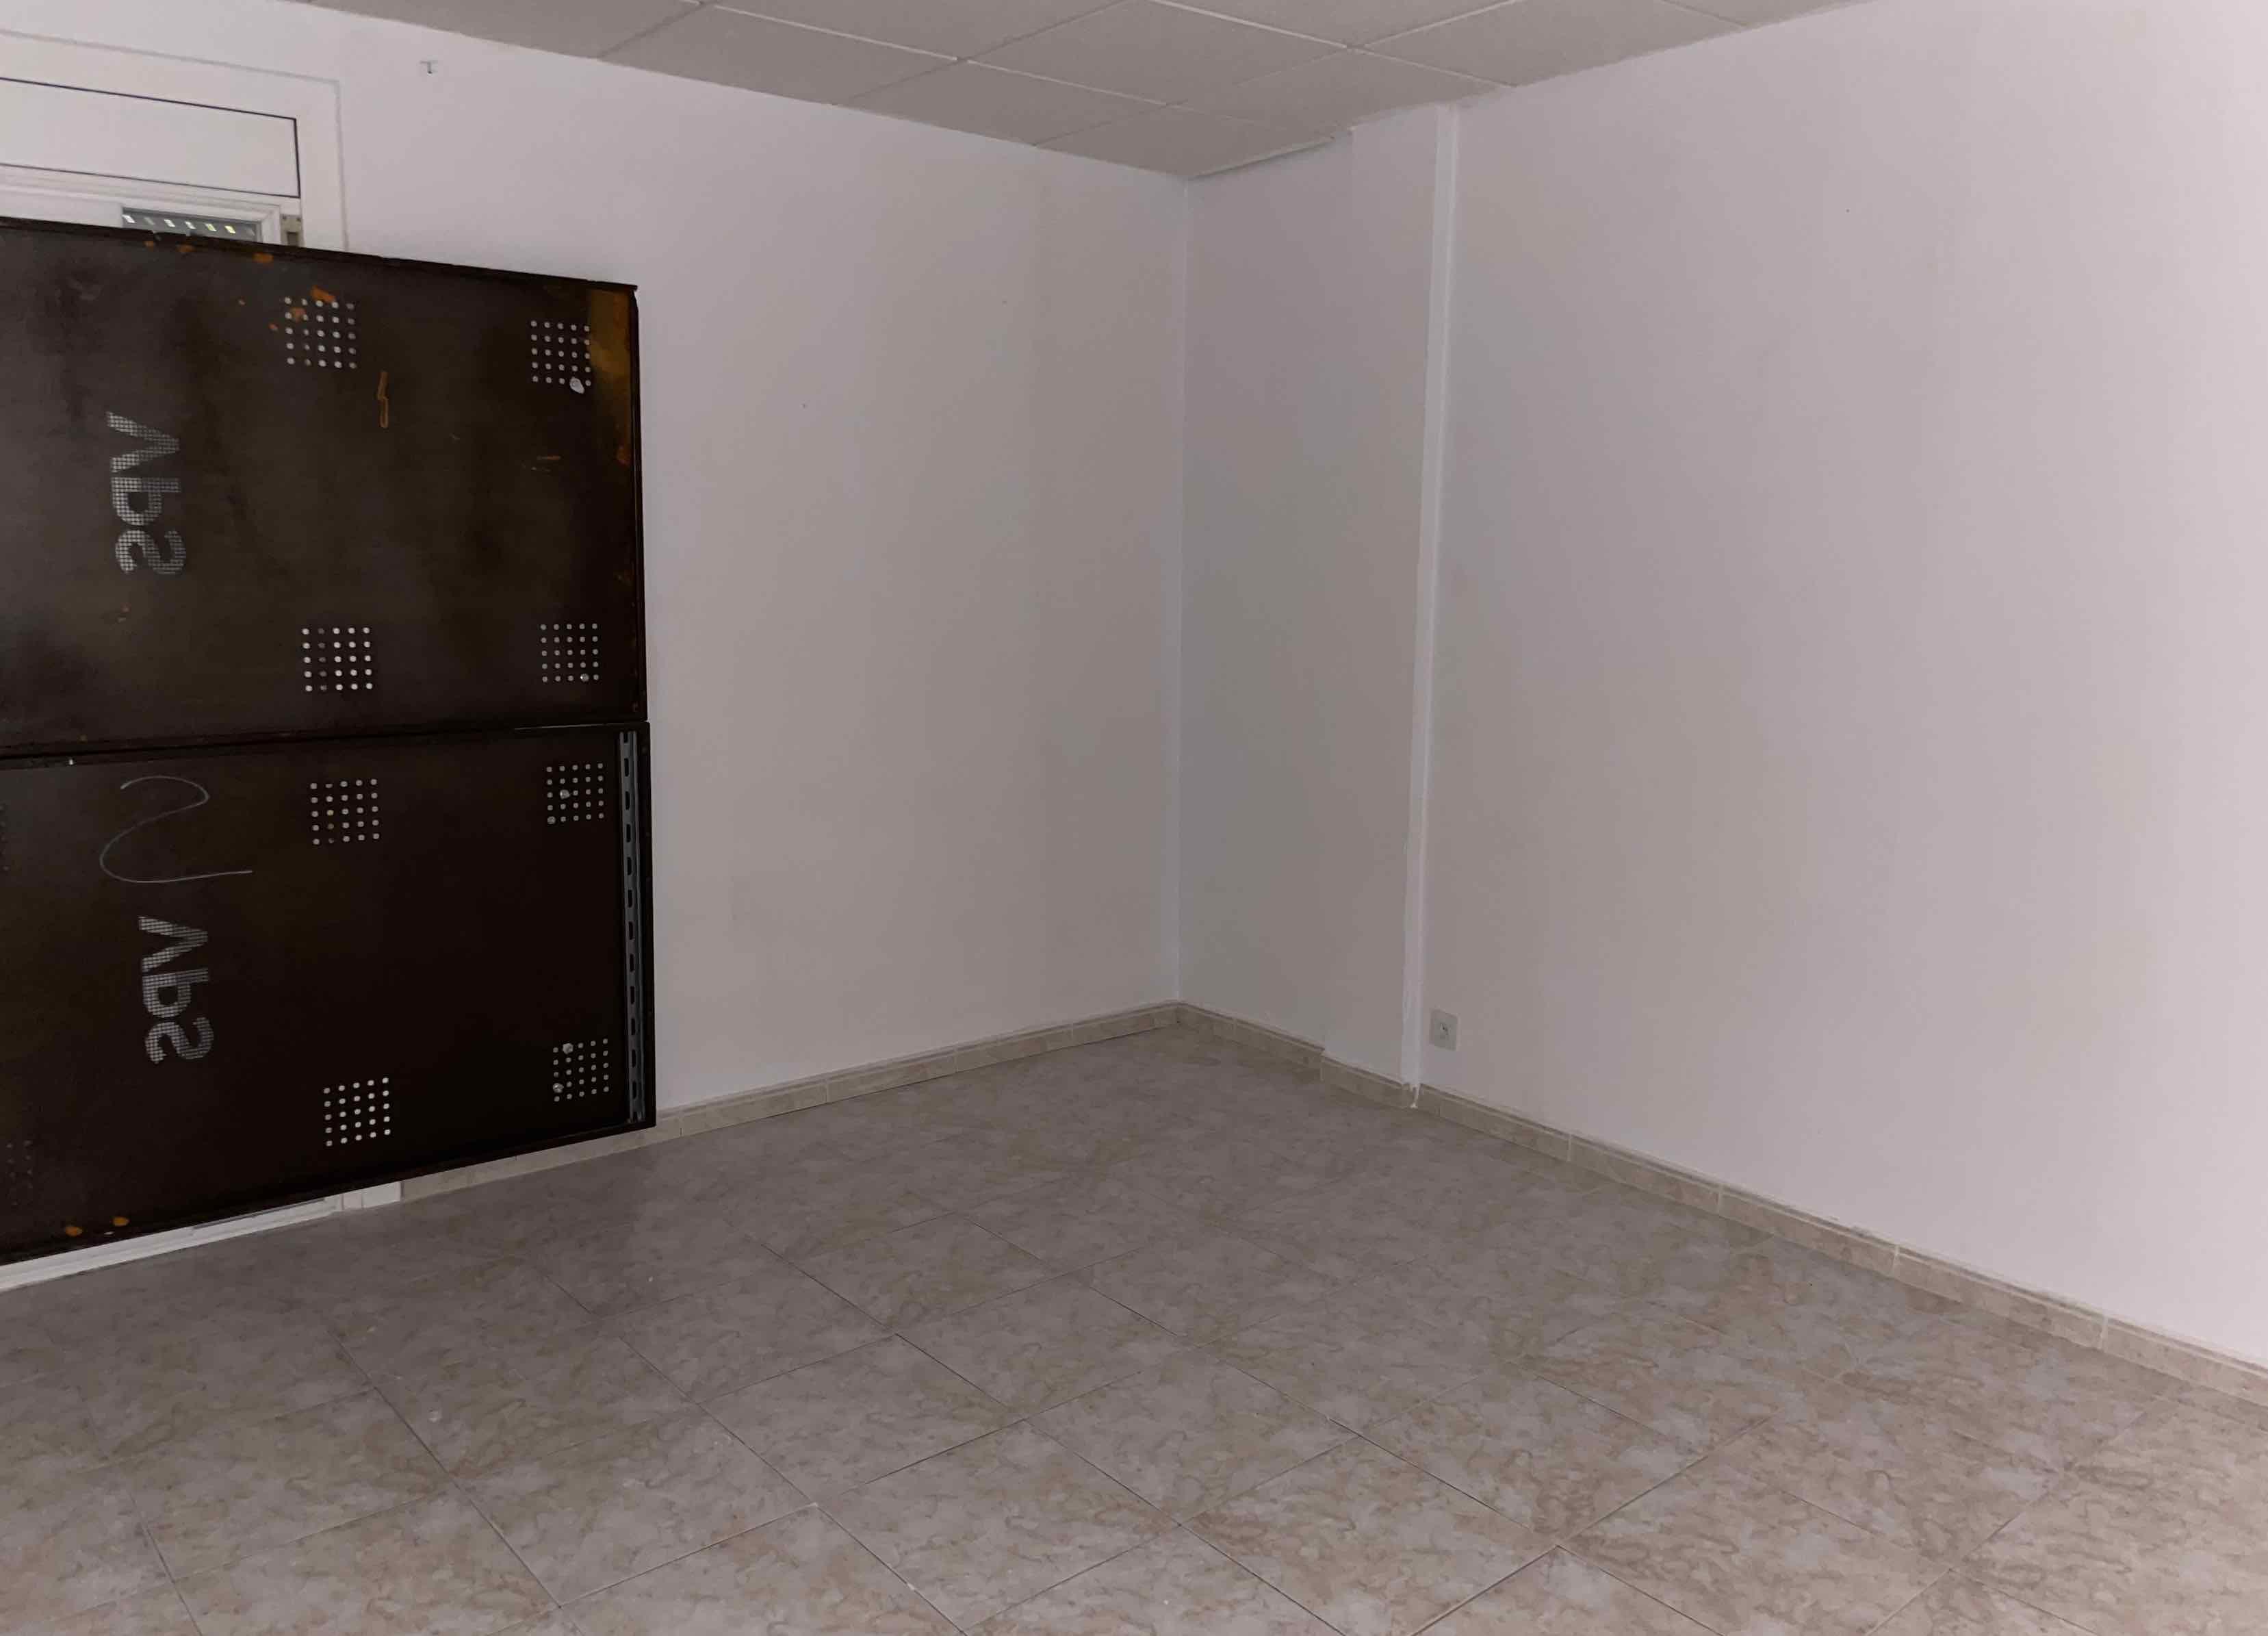 Piso en venta en Cal Ràfols, Vilafranca del Penedès, Barcelona, Plaza Felix Mestre Nuto, 97.000 €, 3 habitaciones, 1 baño, 73 m2